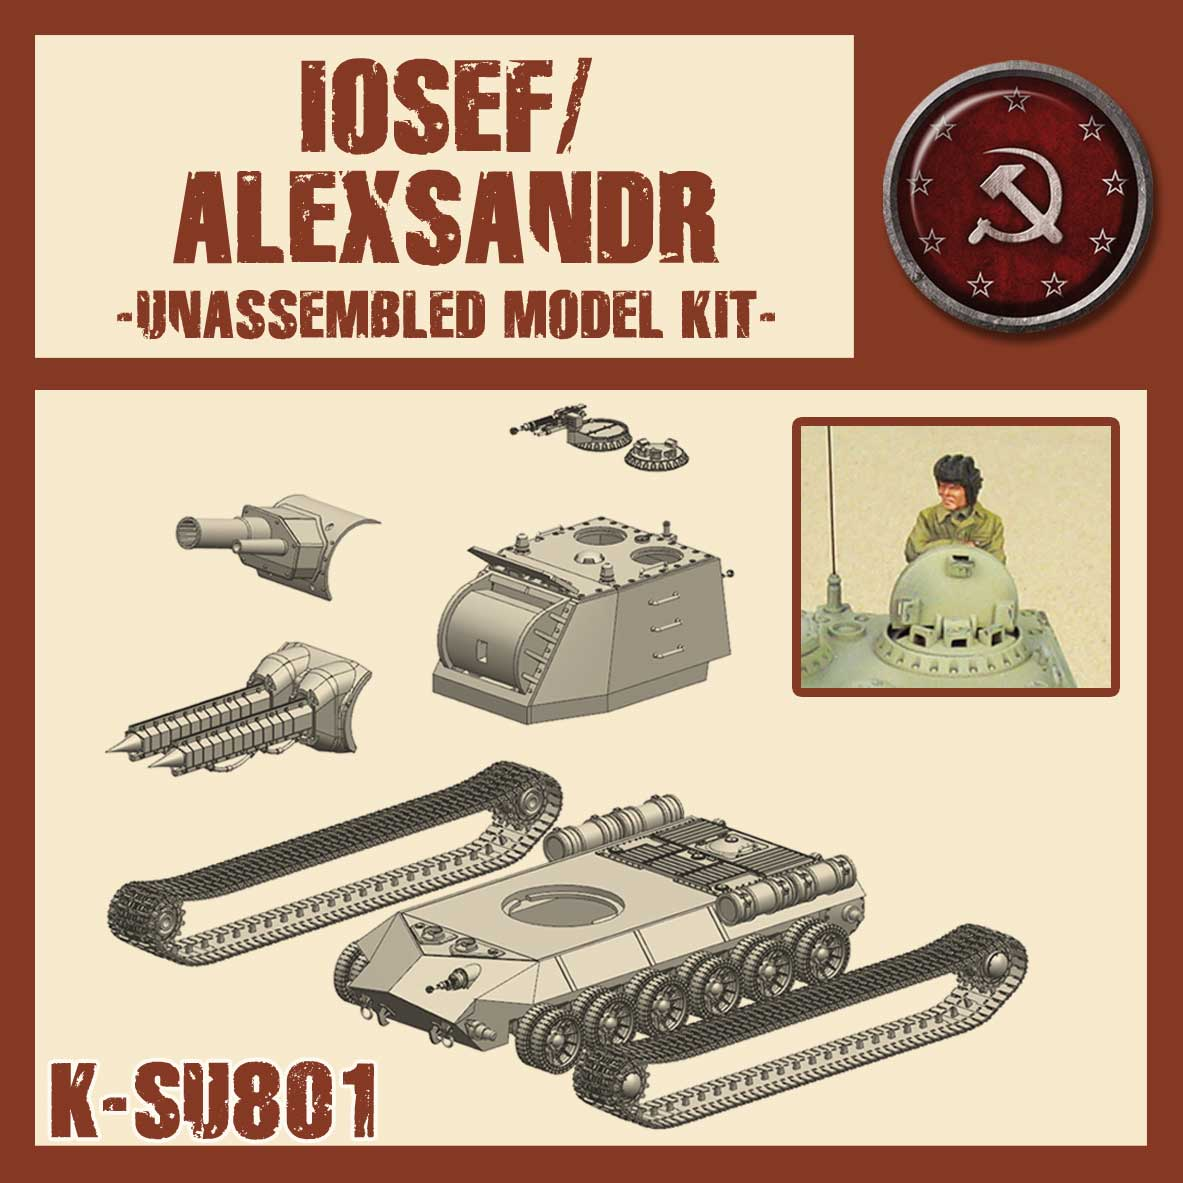 Iosef / Aleksandr Kit